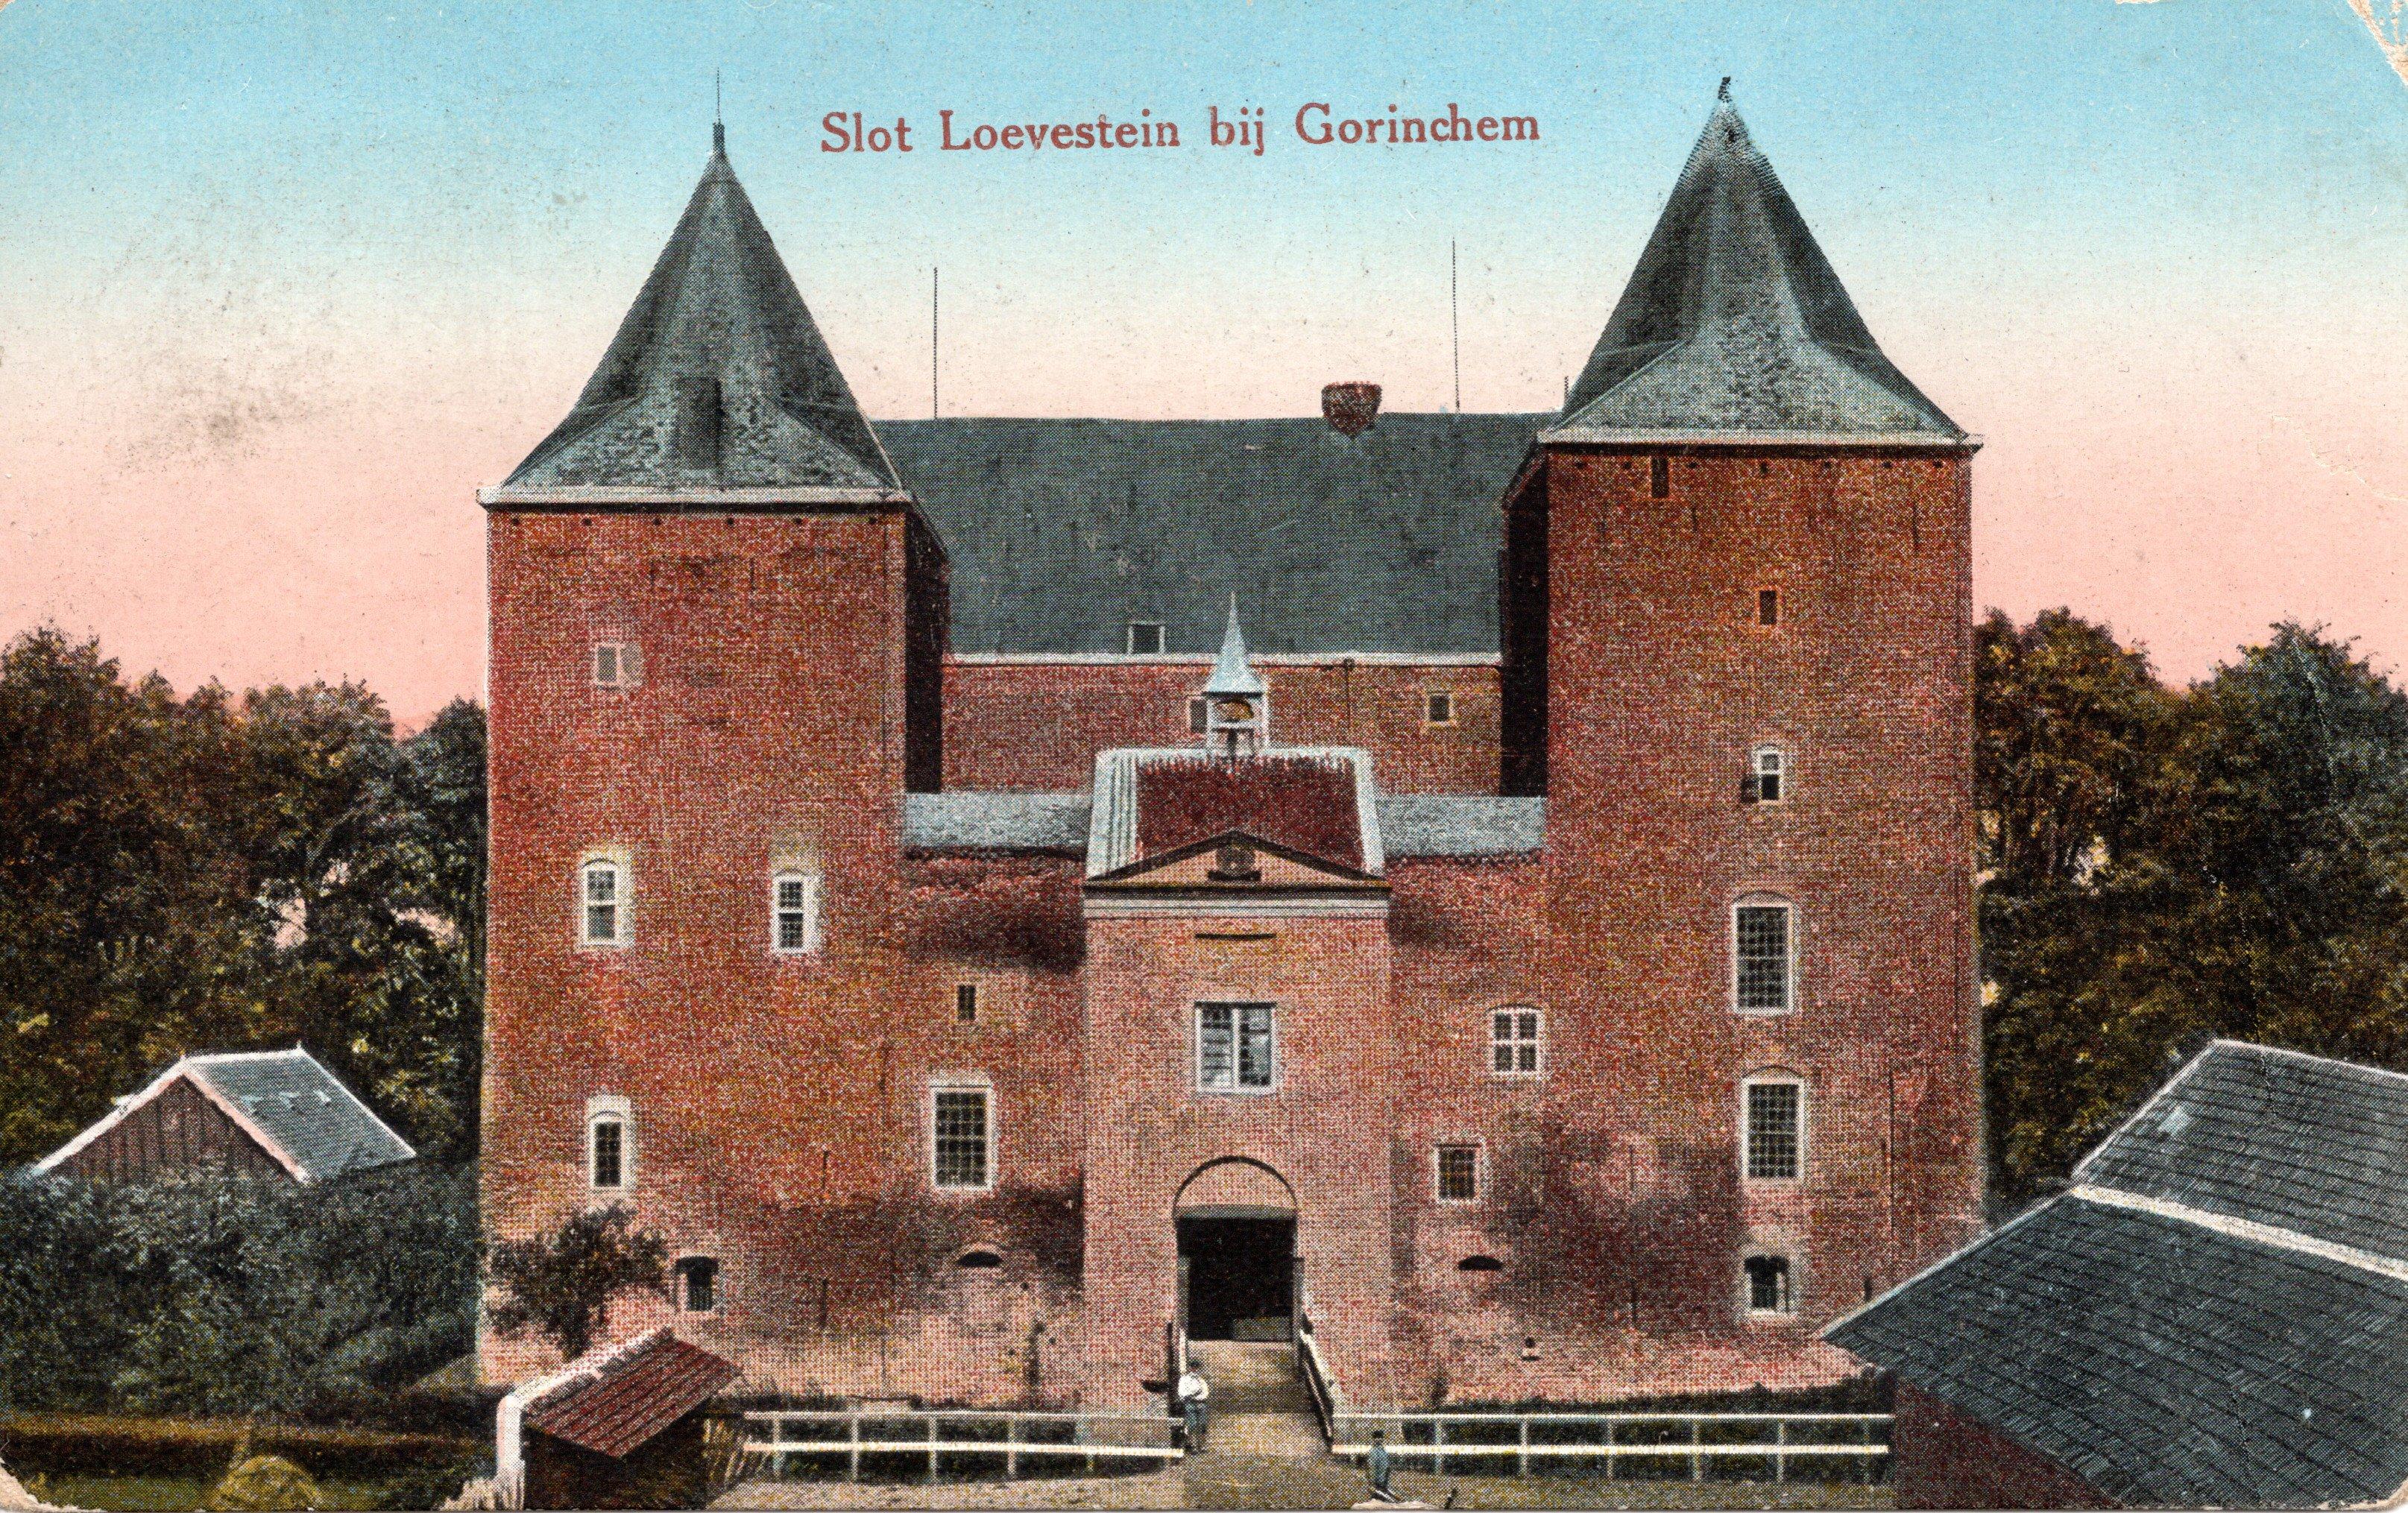 B18-Slot-Loevestein-bij-Gorinchem-1925